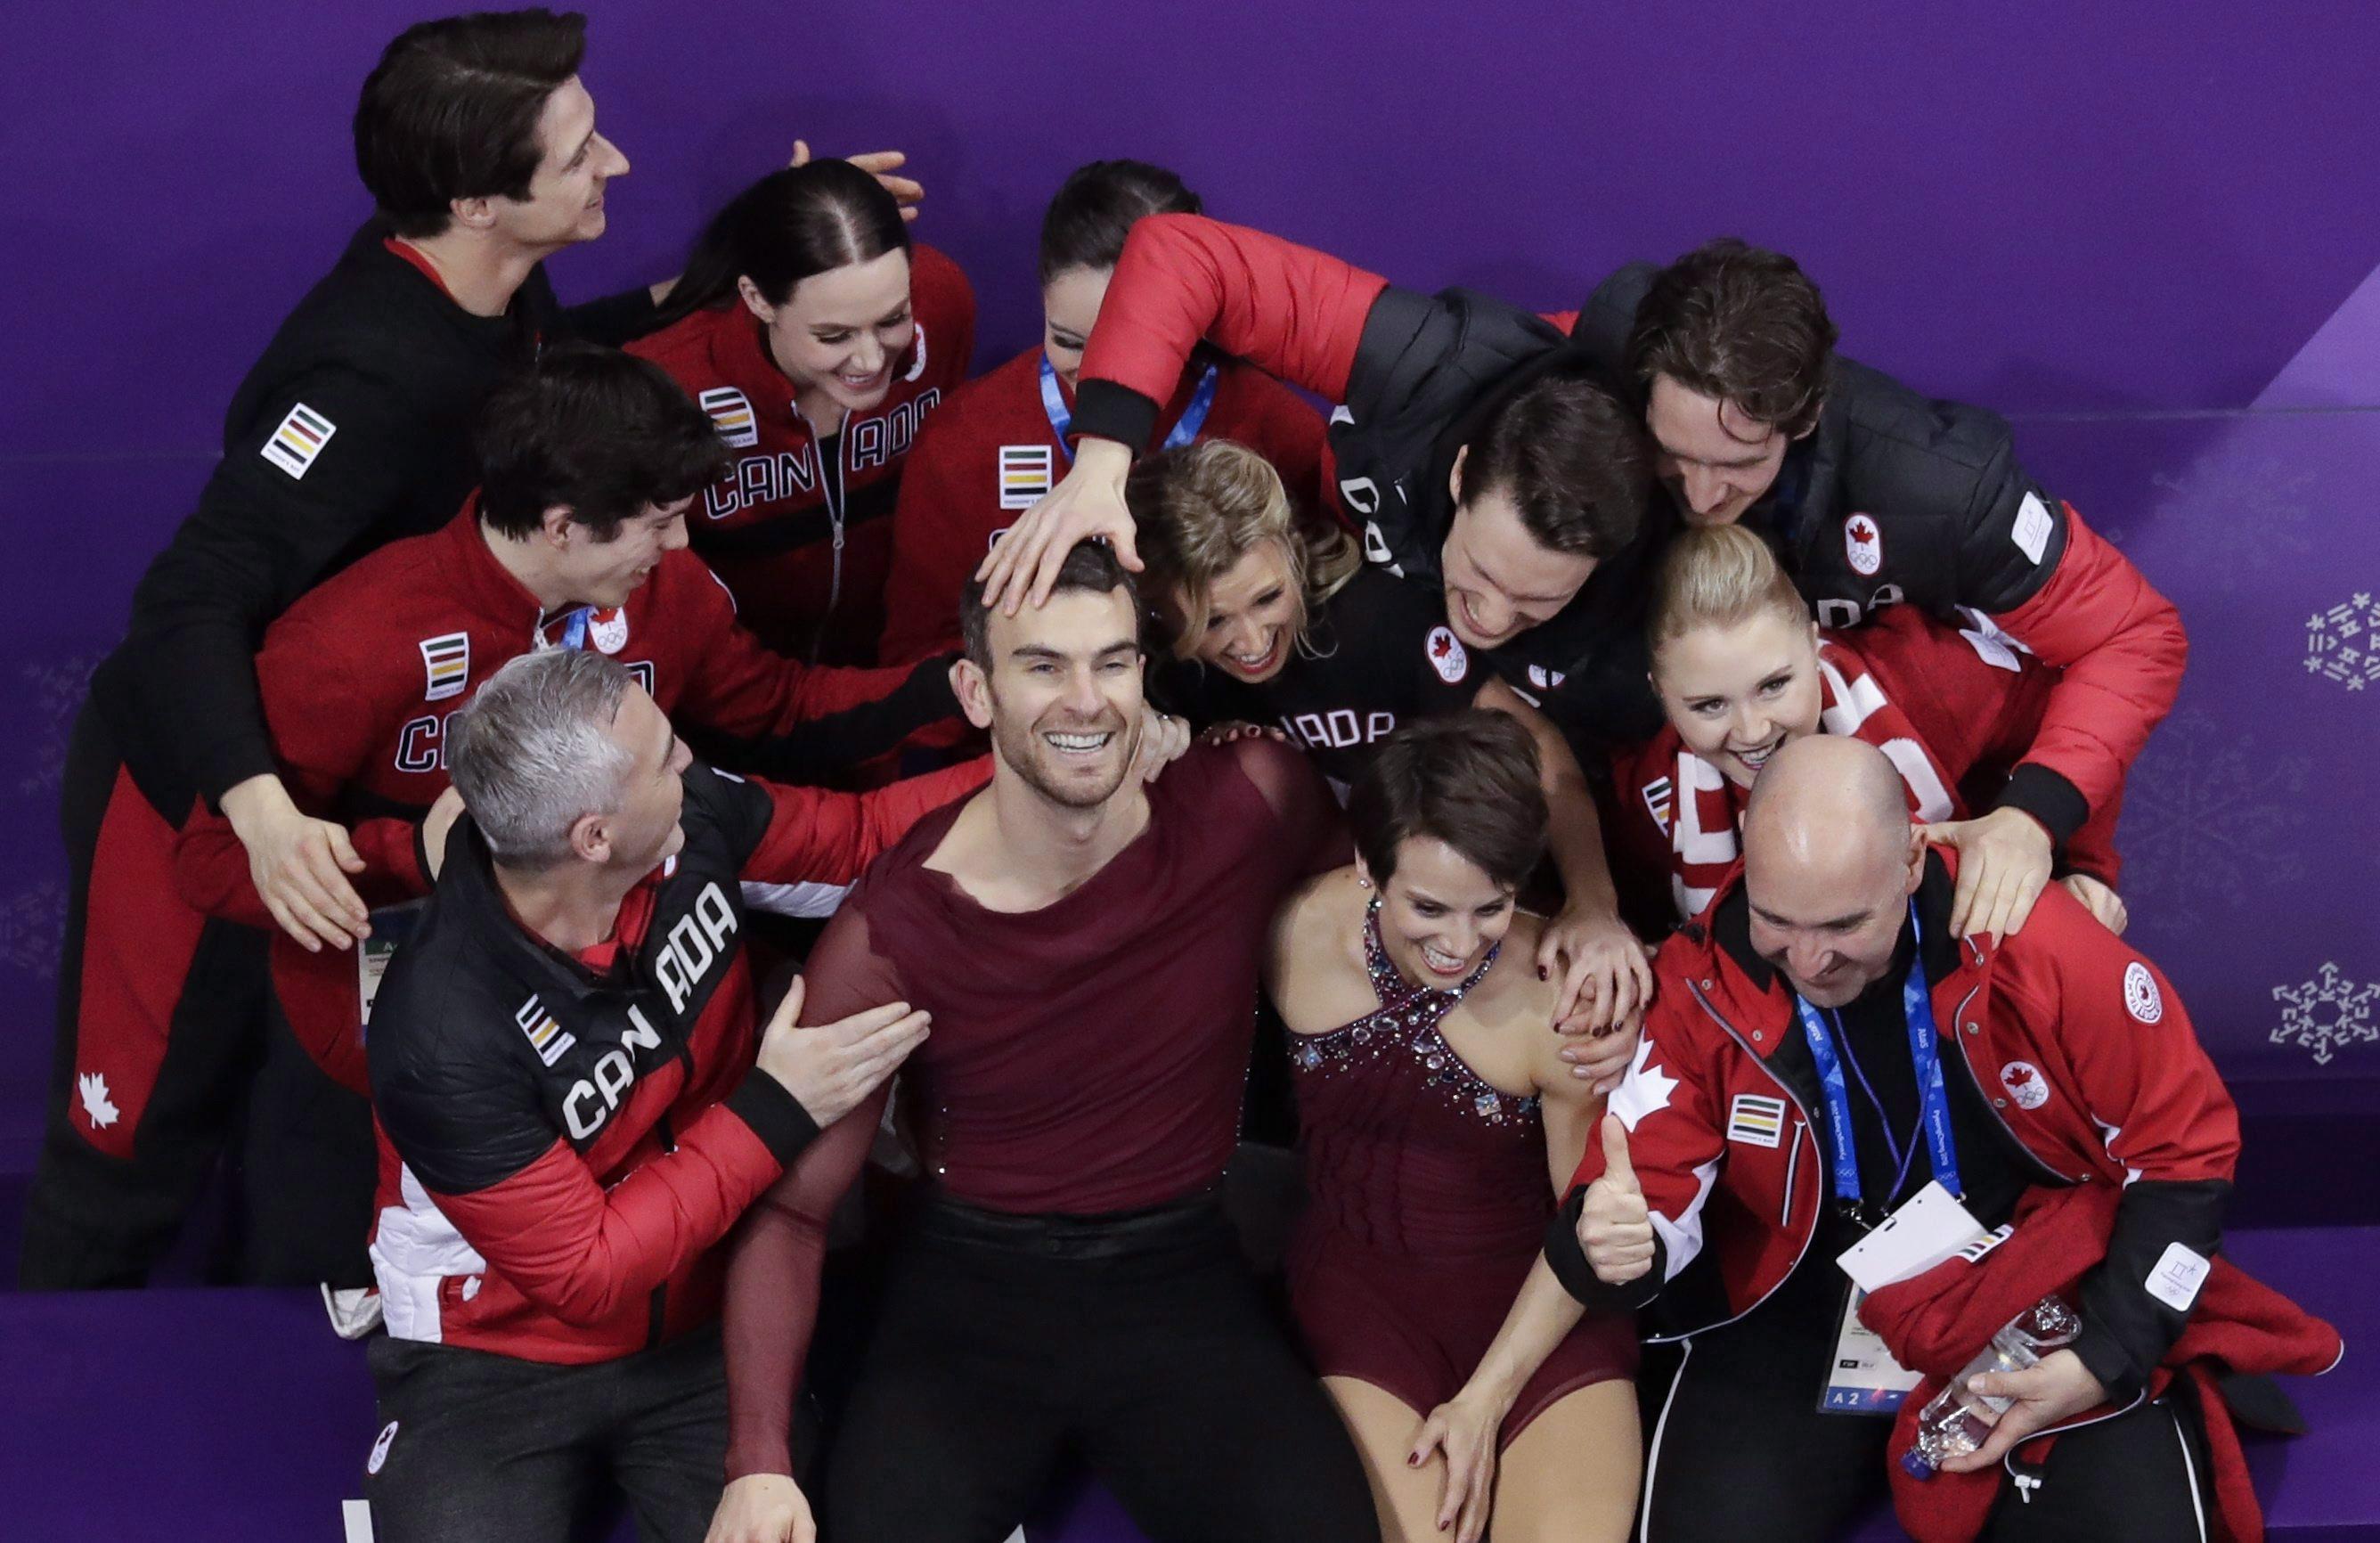 Meagan Duhamel and Eric Radford and Team Canada athletes celebrating after performance.